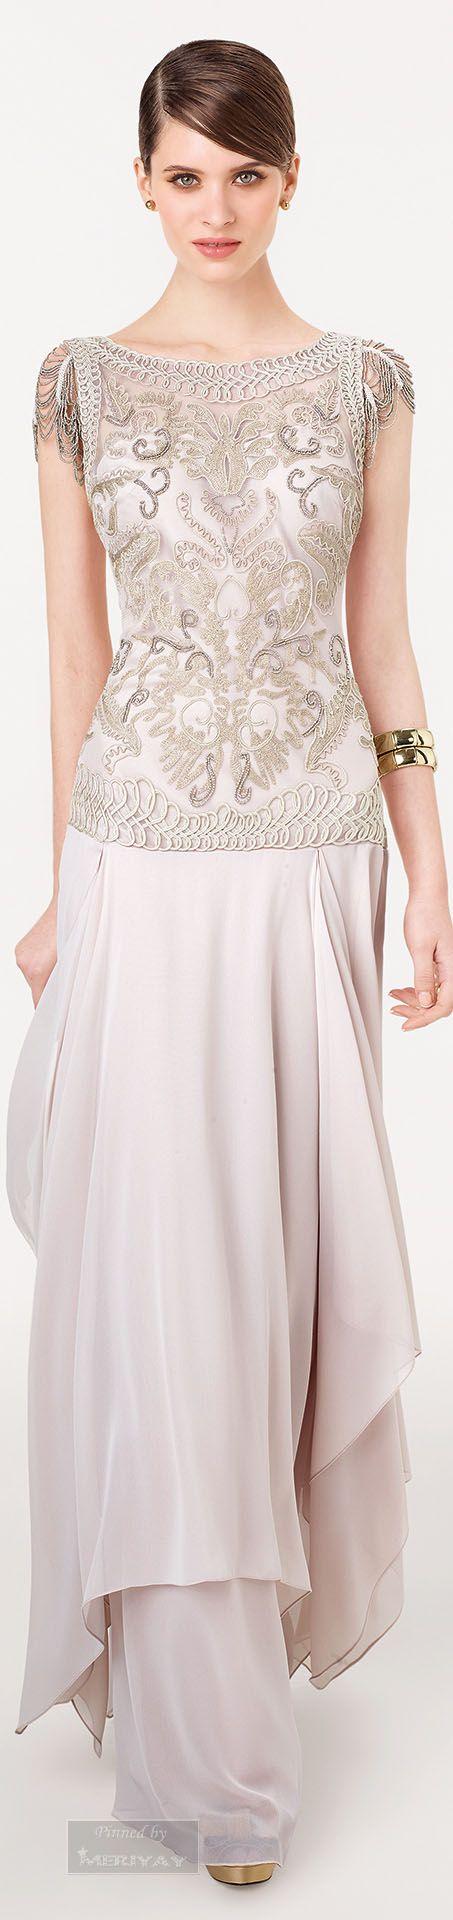 Mother of the bride dresses+island wedding   best Elbiseler images on Pinterest  Brokat Evening gowns and